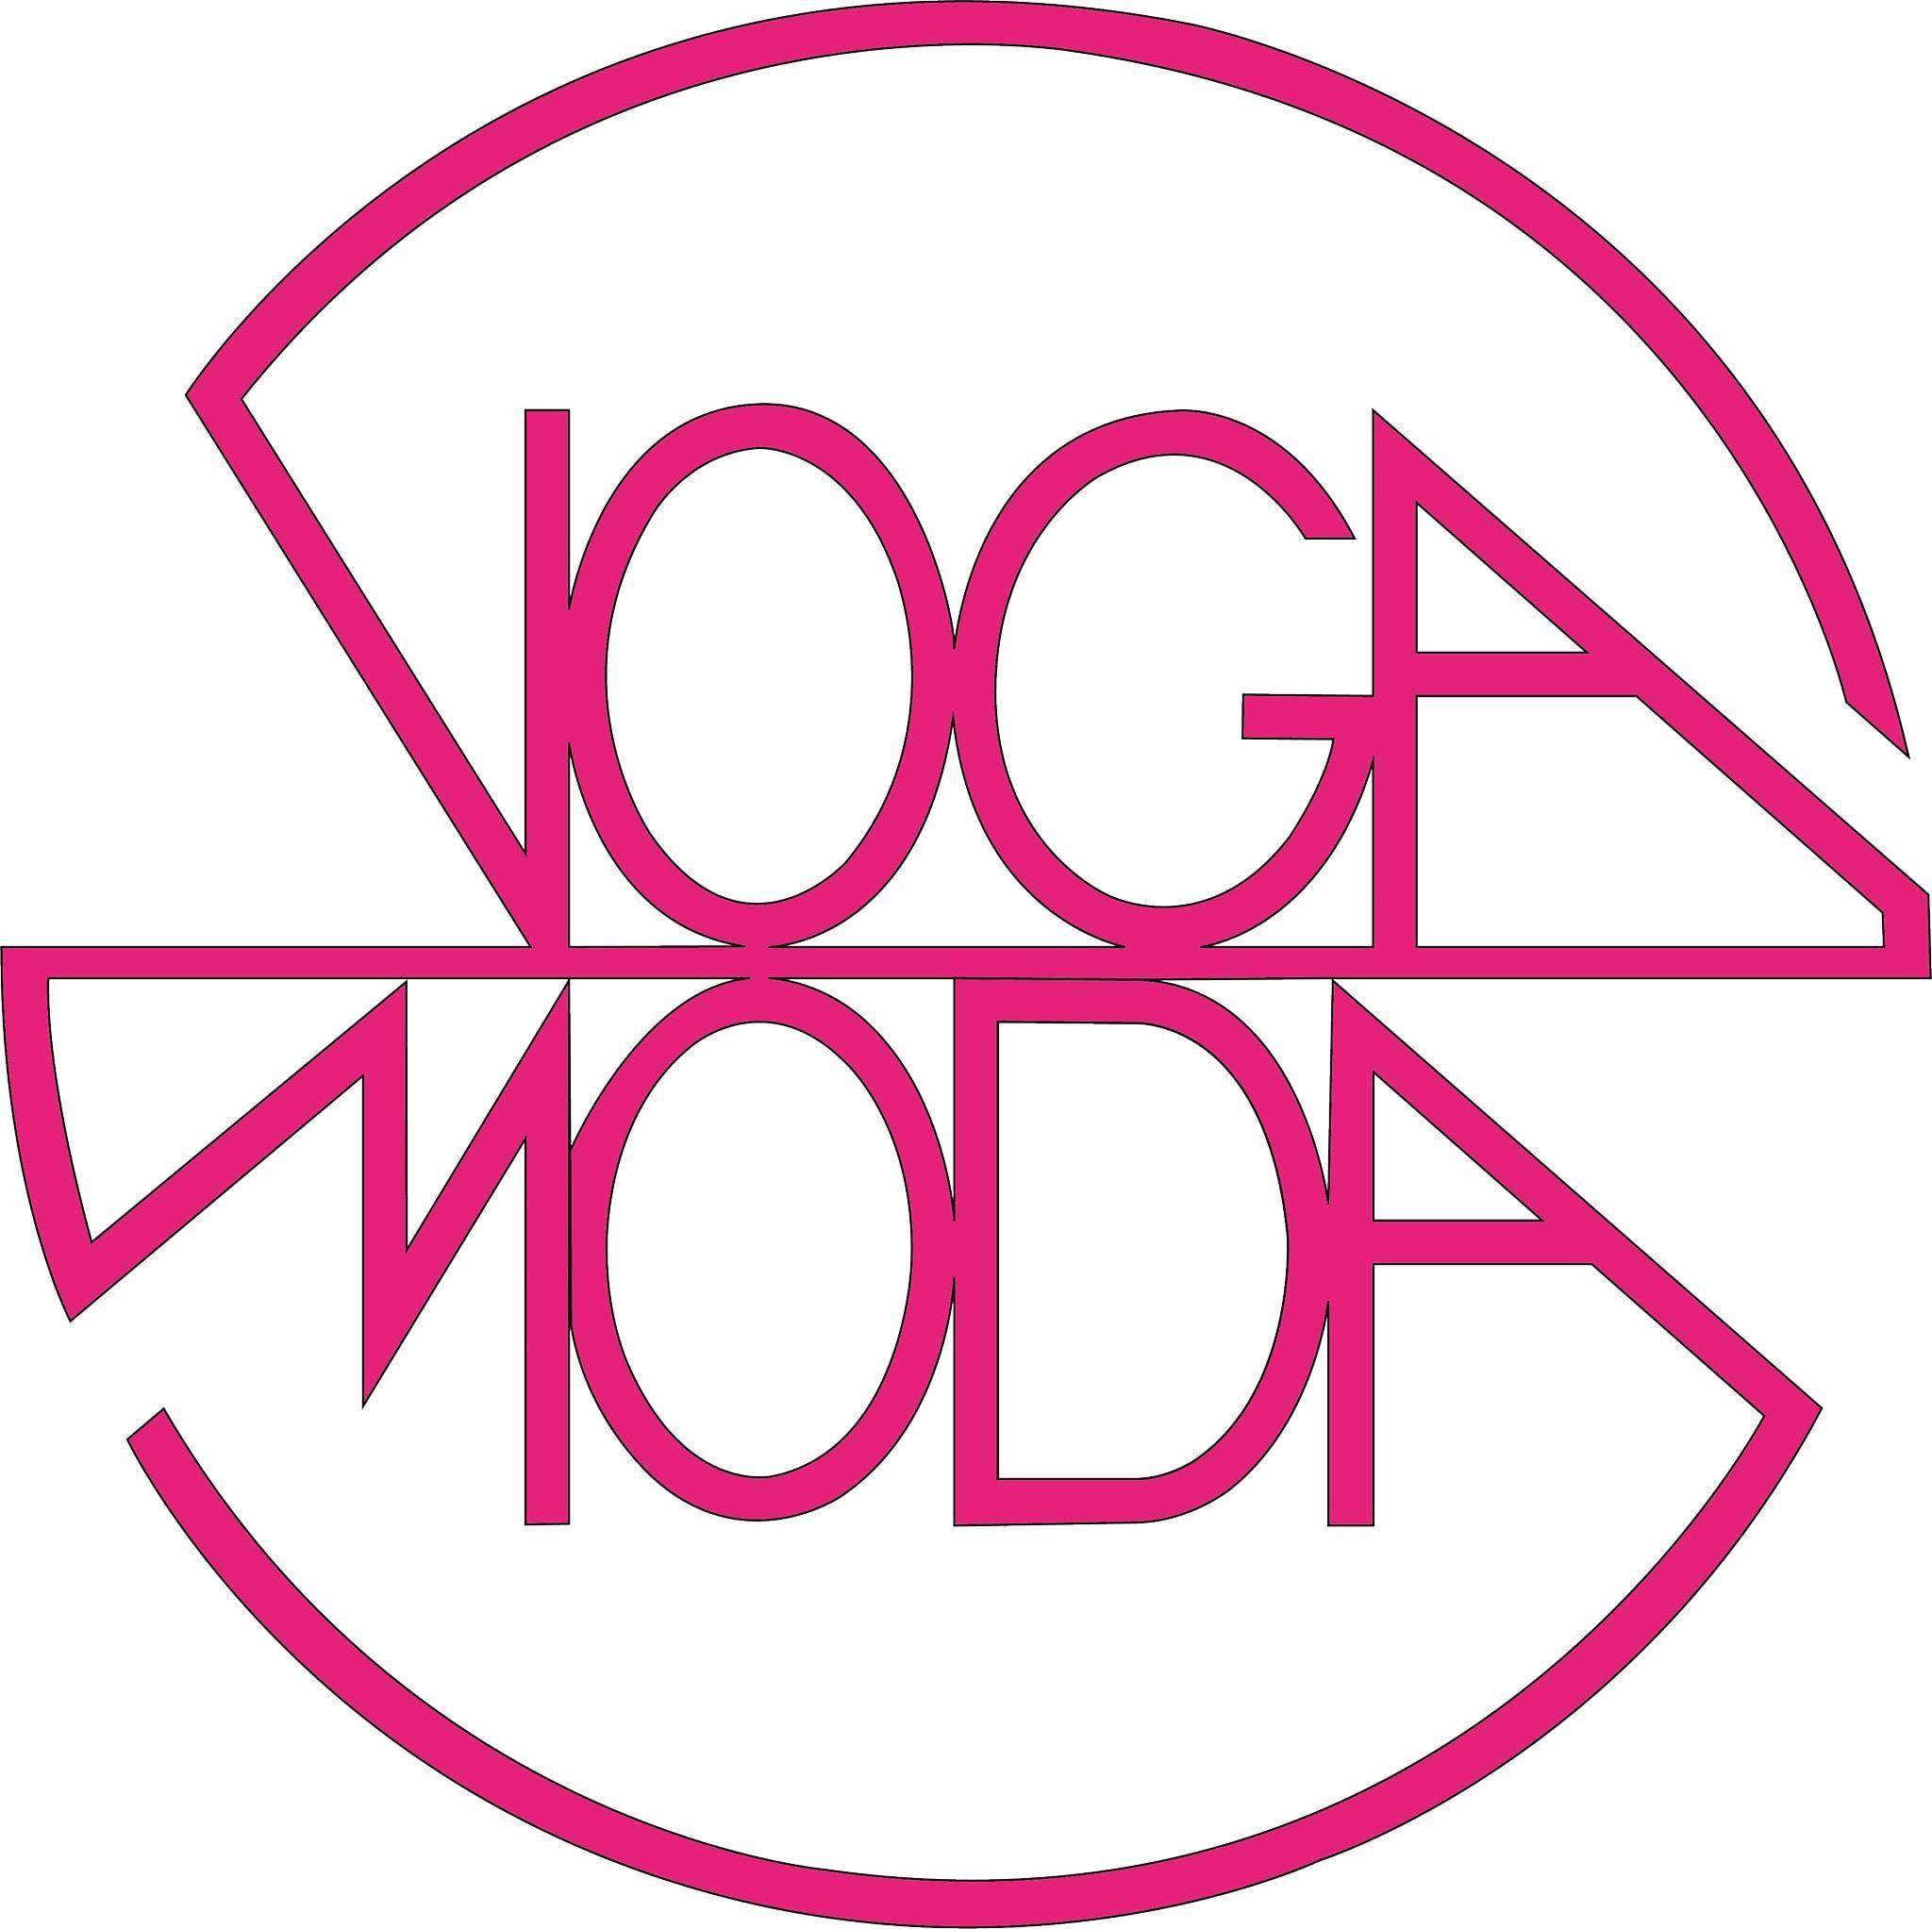 Voga-moda.cz